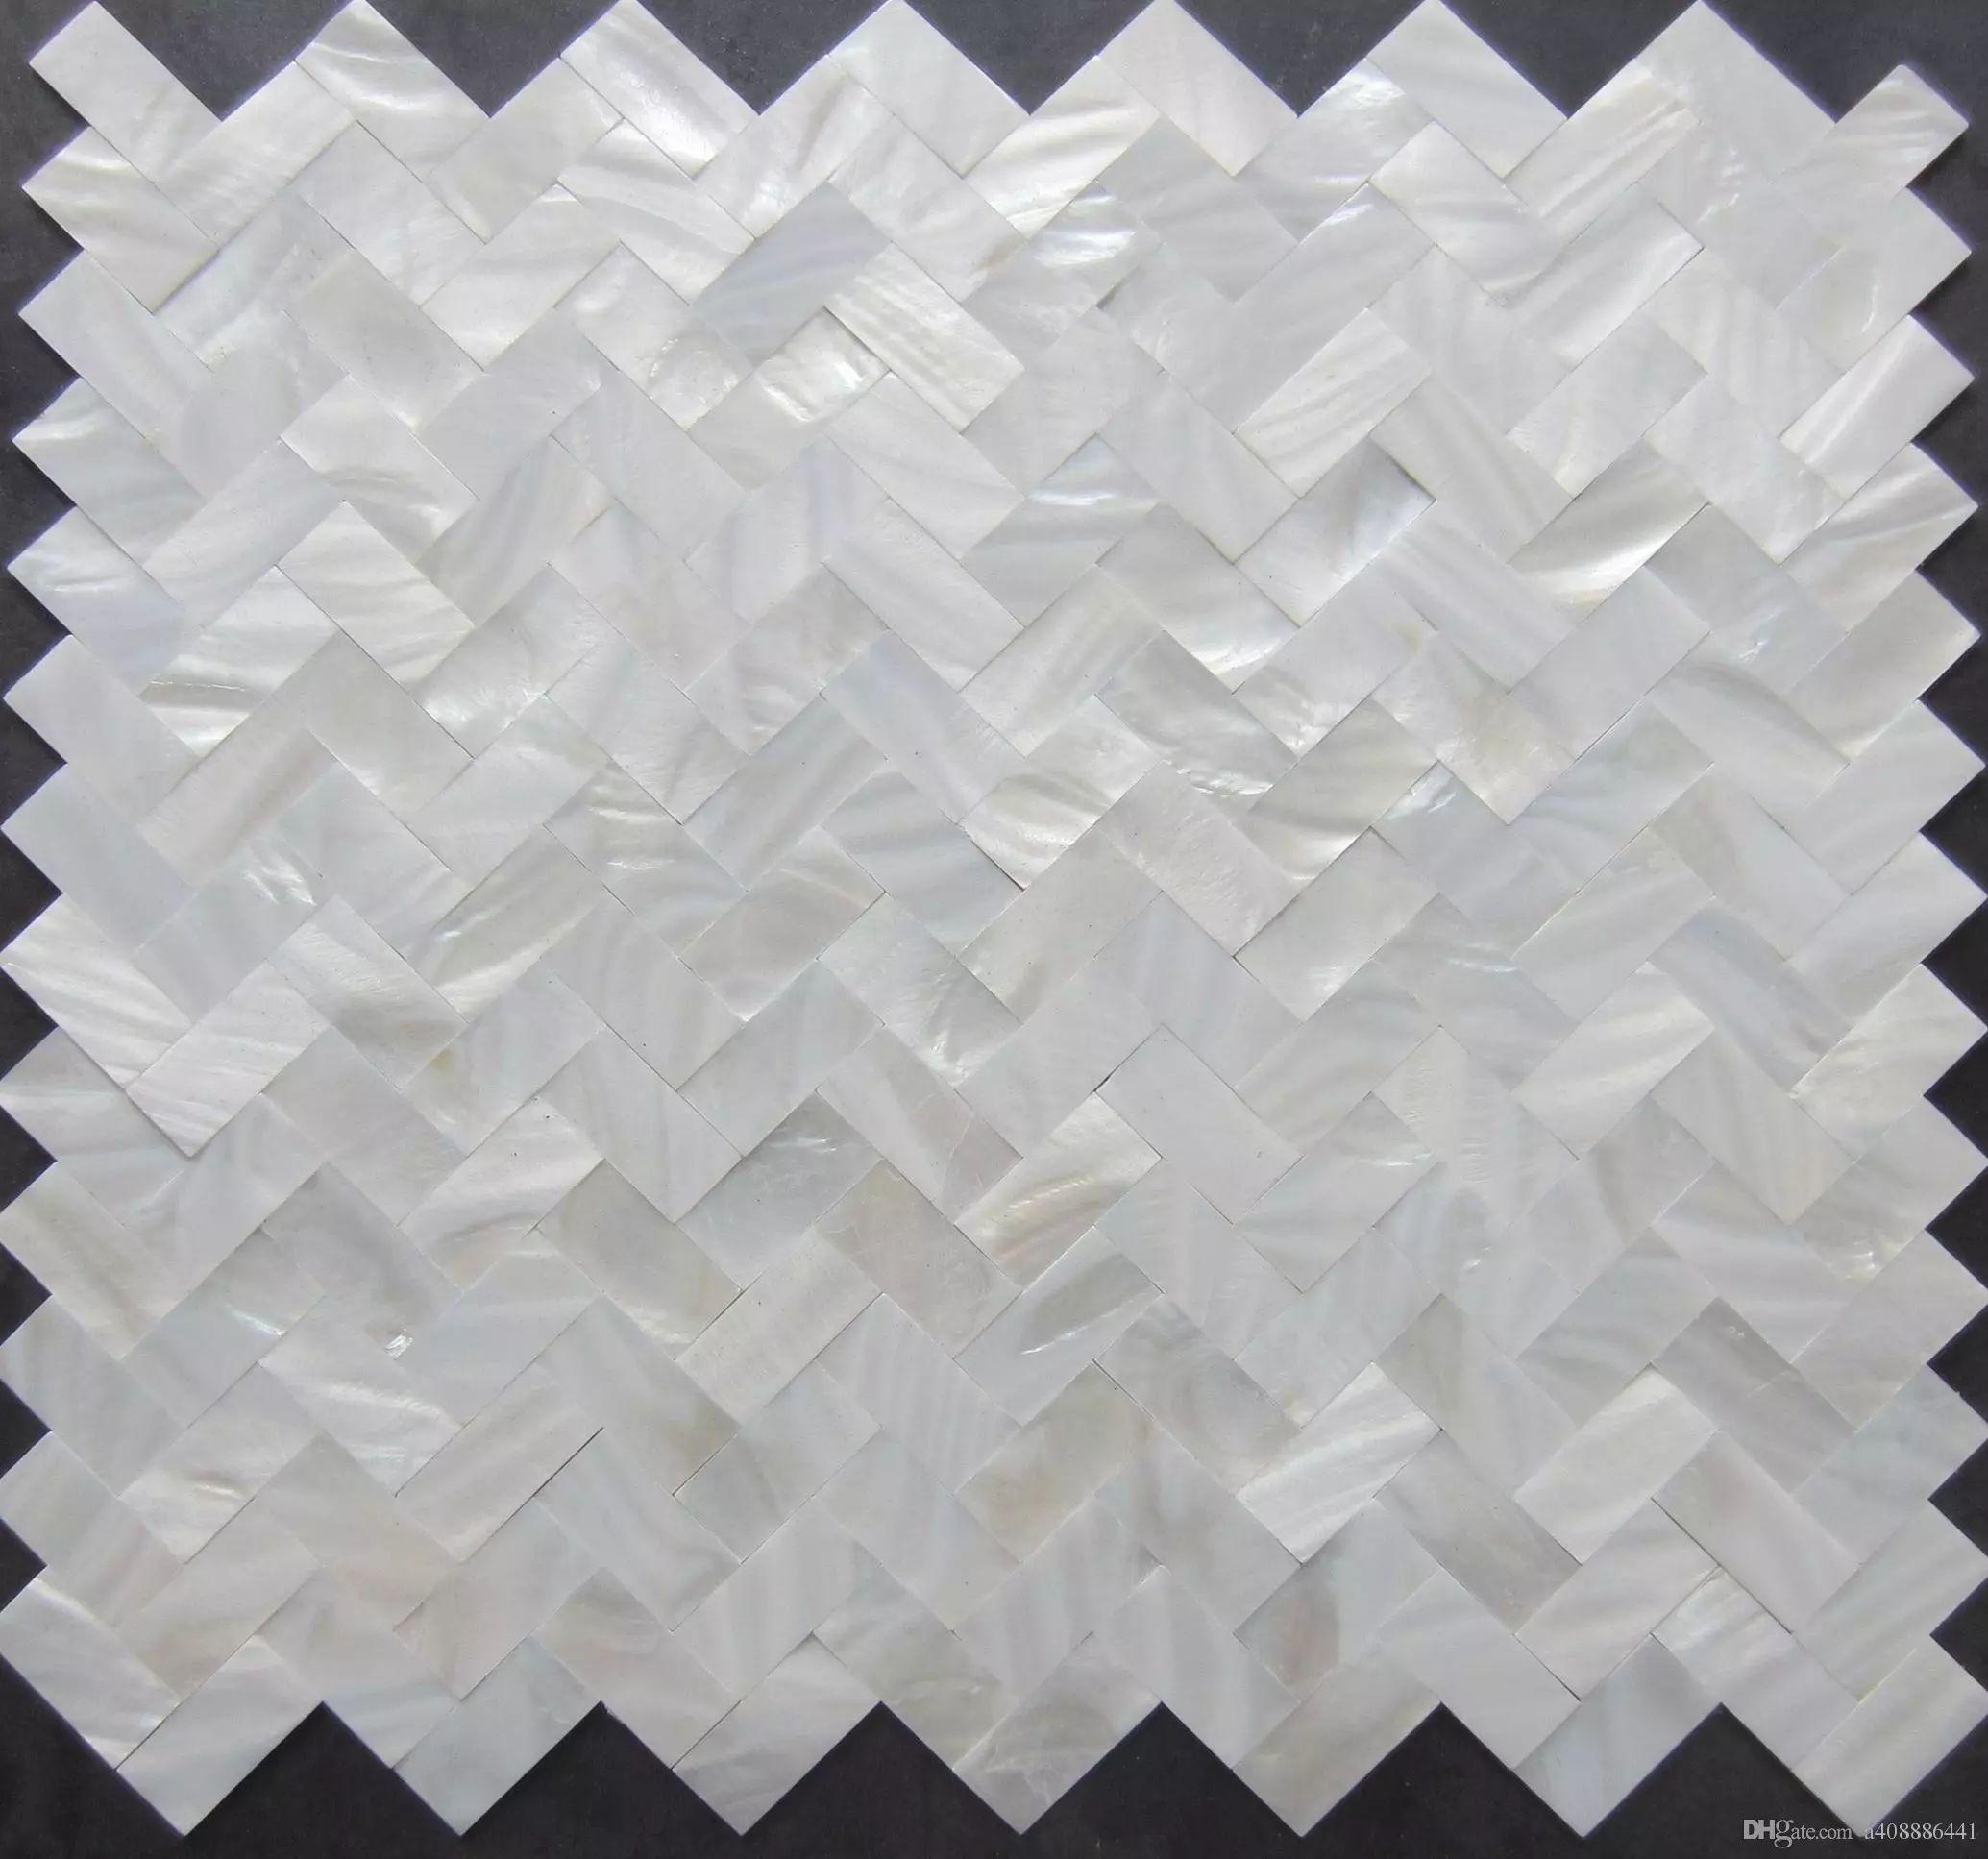 2017 2017 new style!!! herringbone mosaics tiles; white mother of